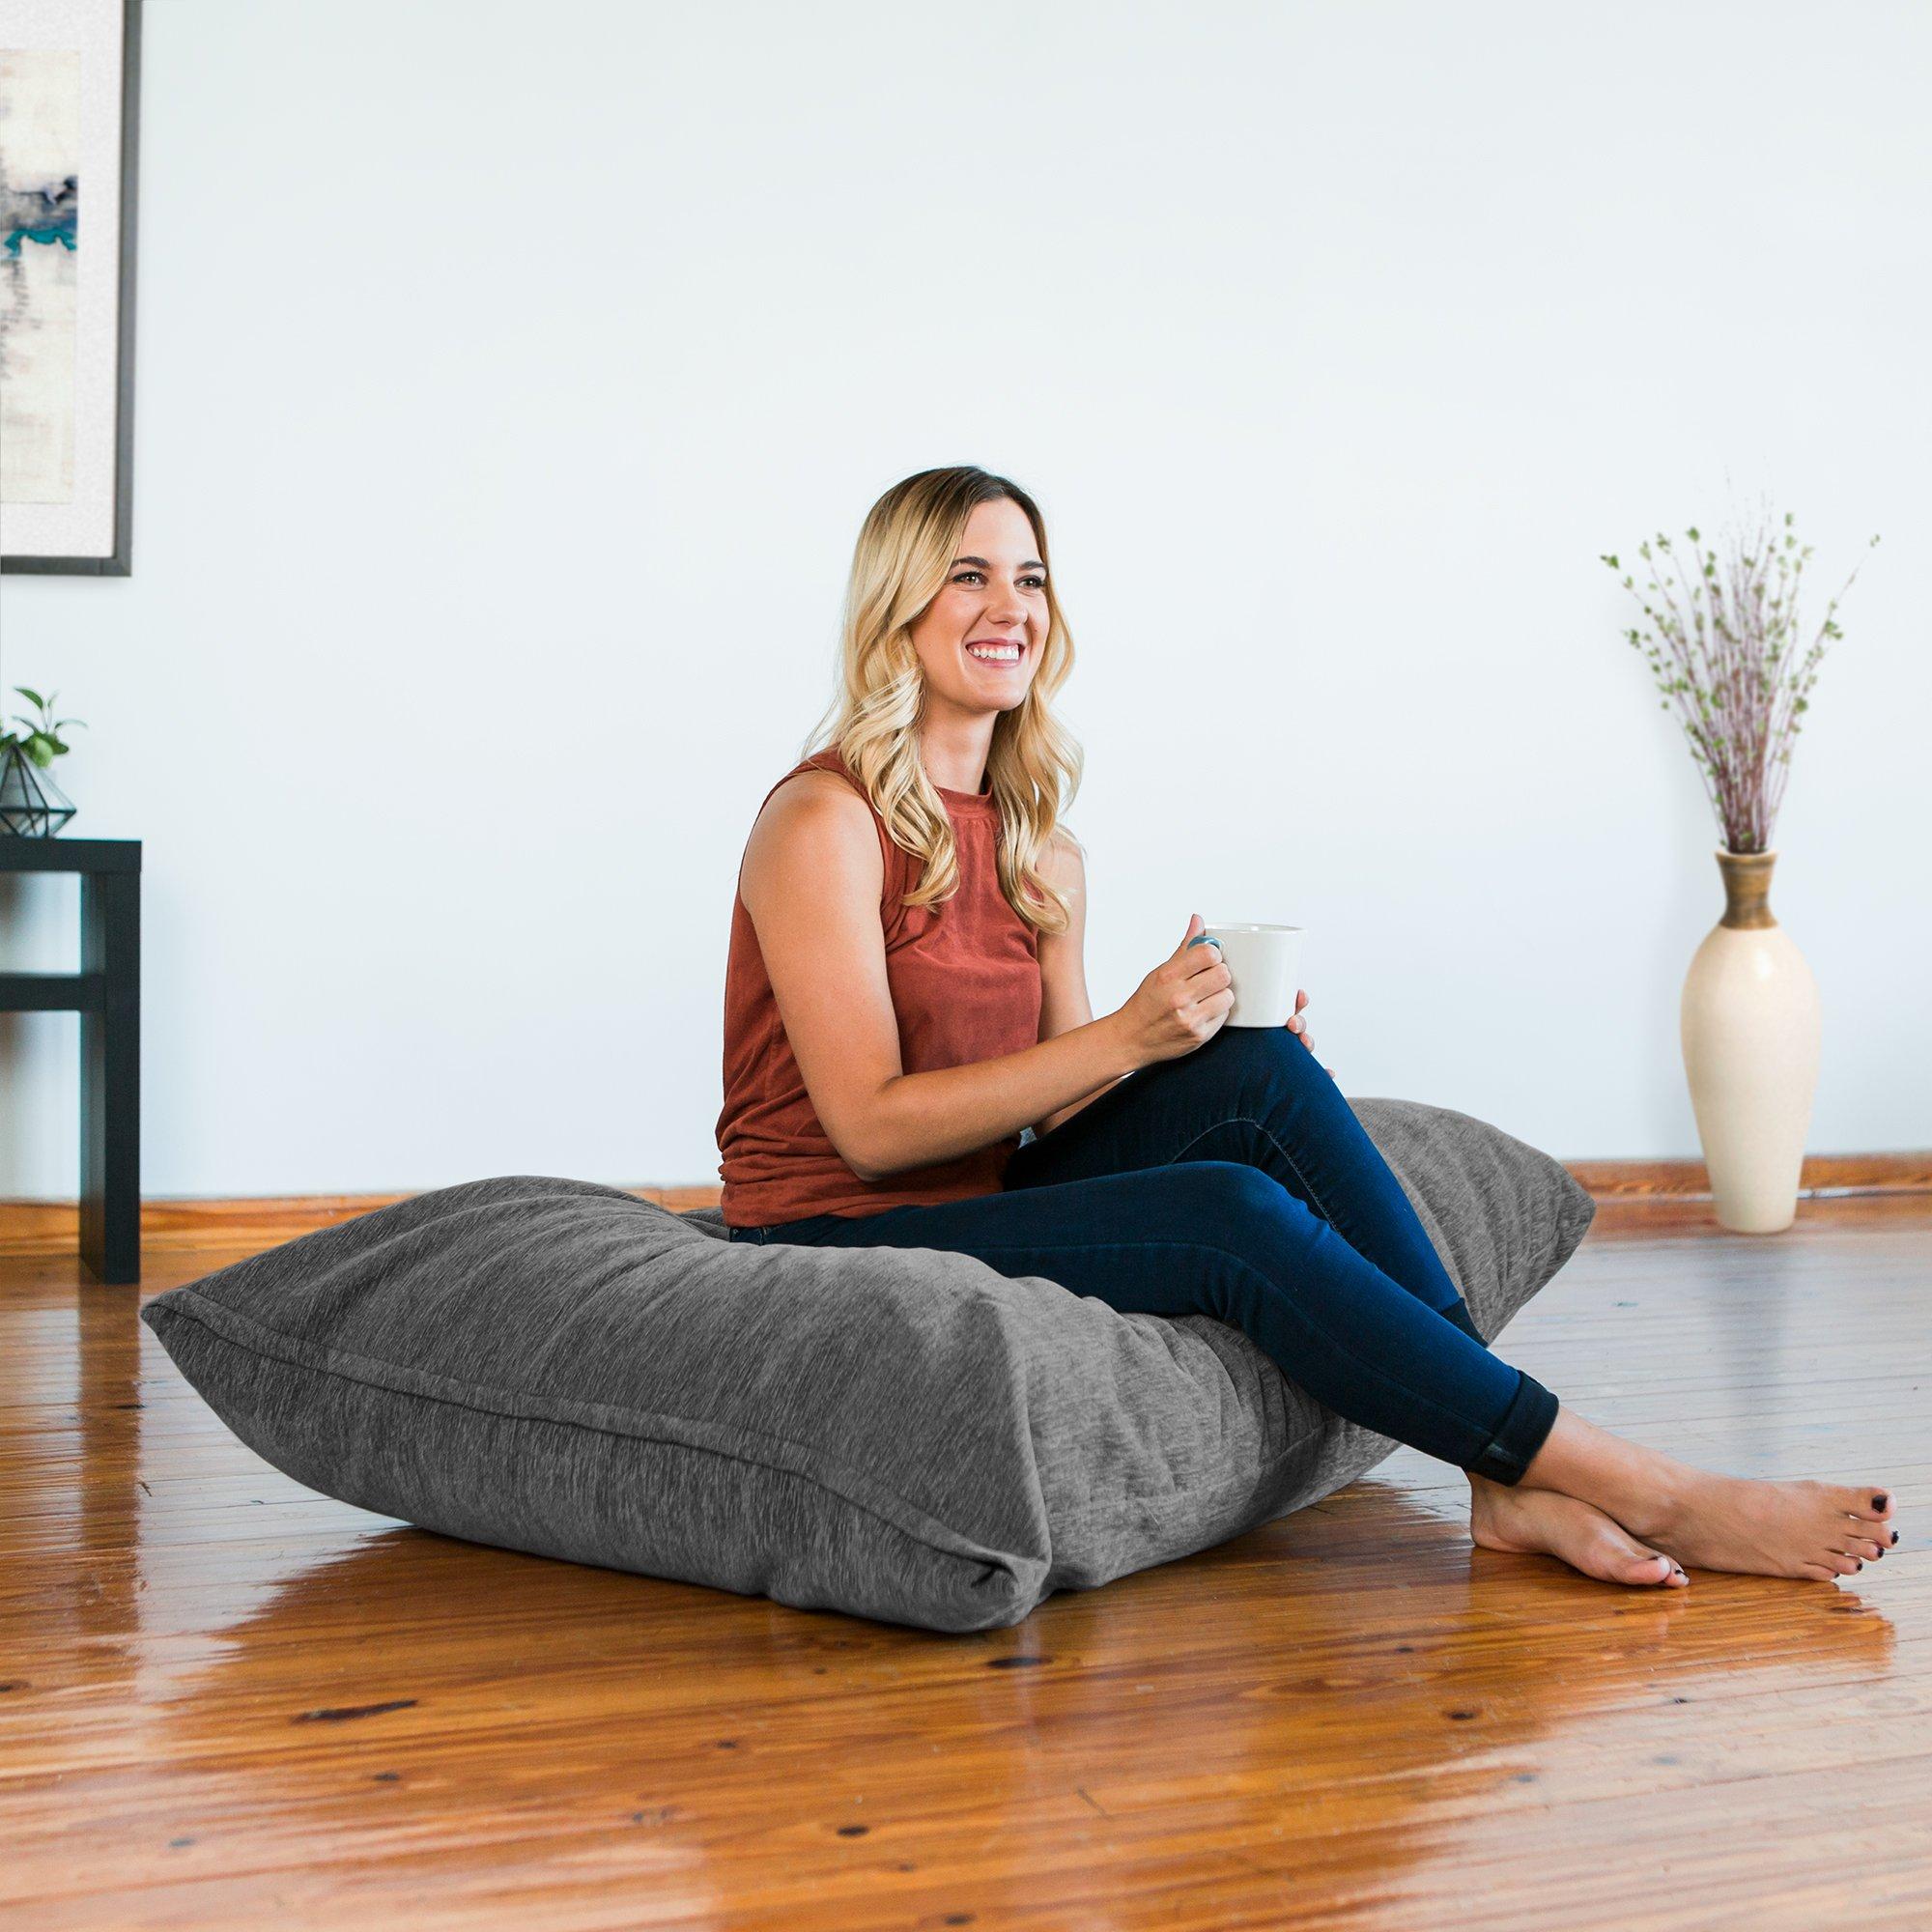 JaxxPillow Saxx 3.5 Foot Giant Décor Floor Pillow, Premium Chenille Cover Grey by Jaxx